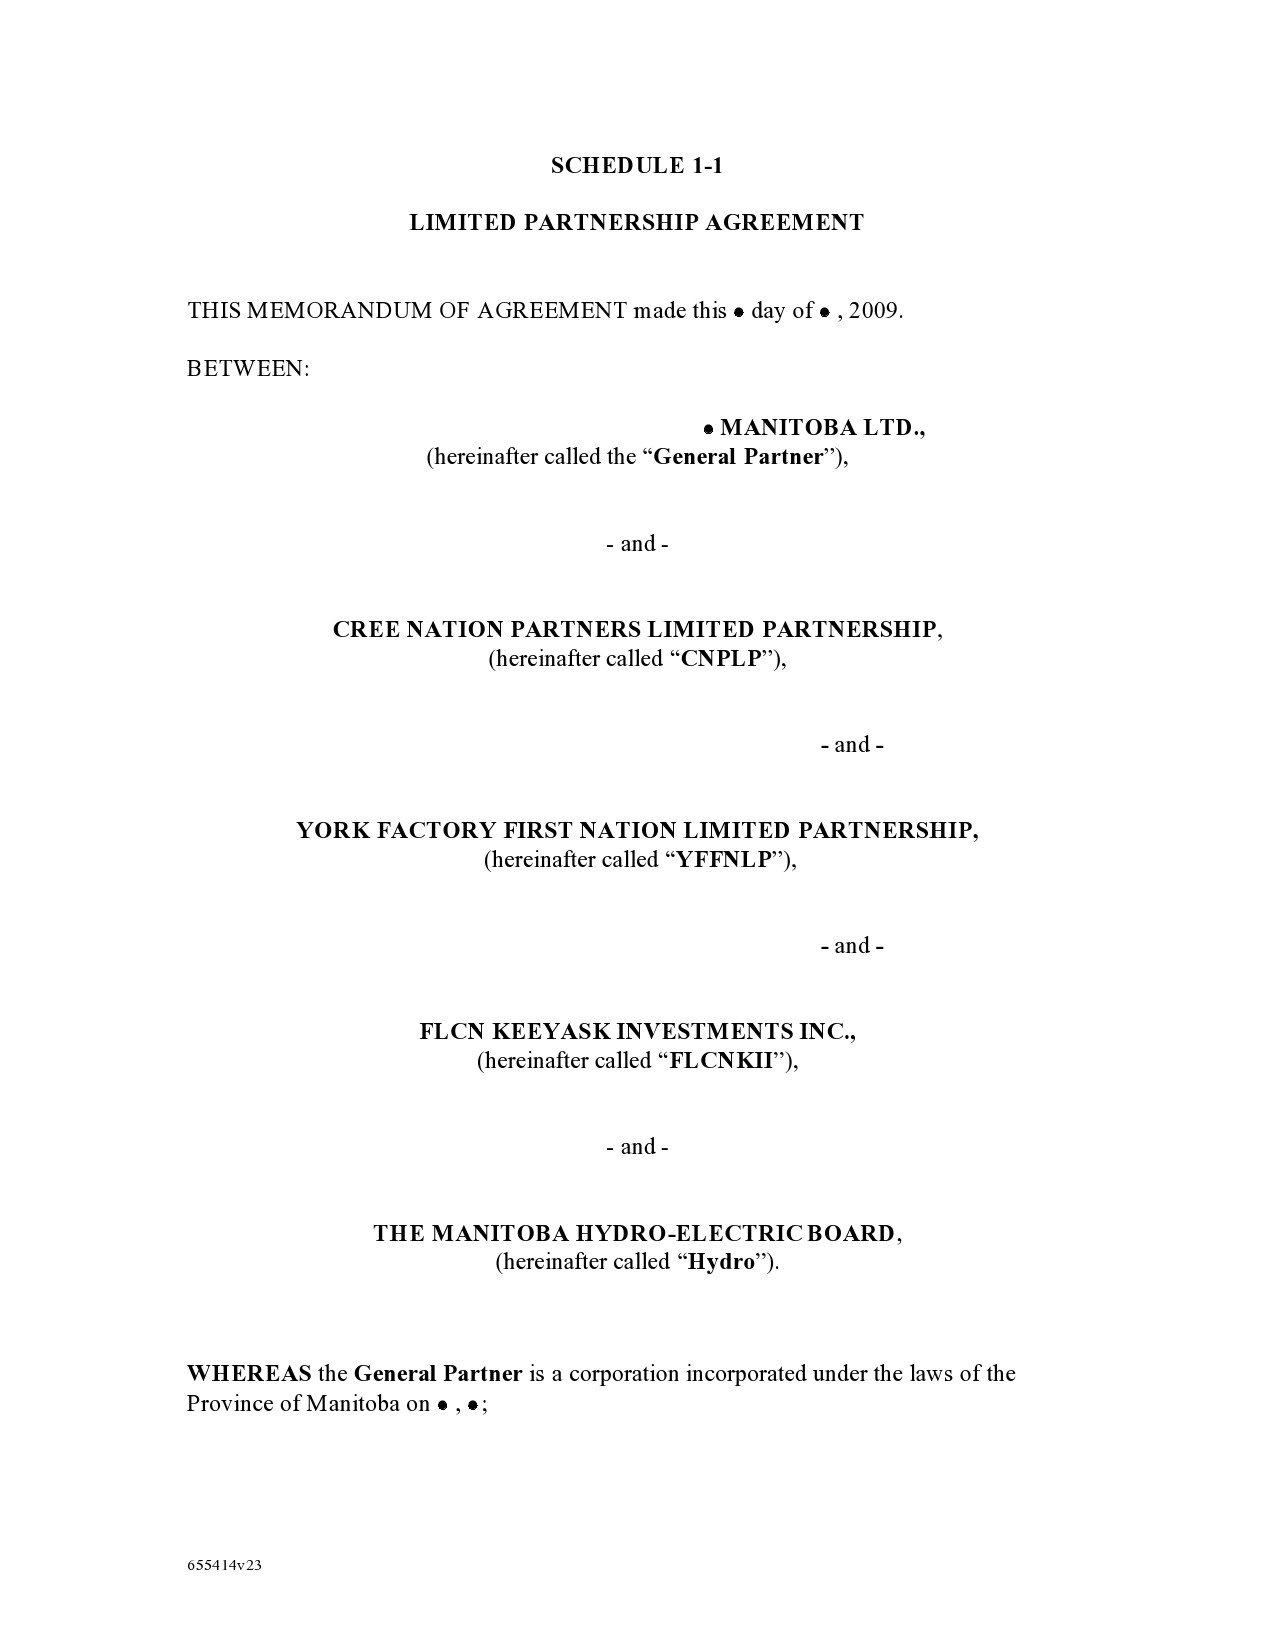 Free limited partnership agreement 14